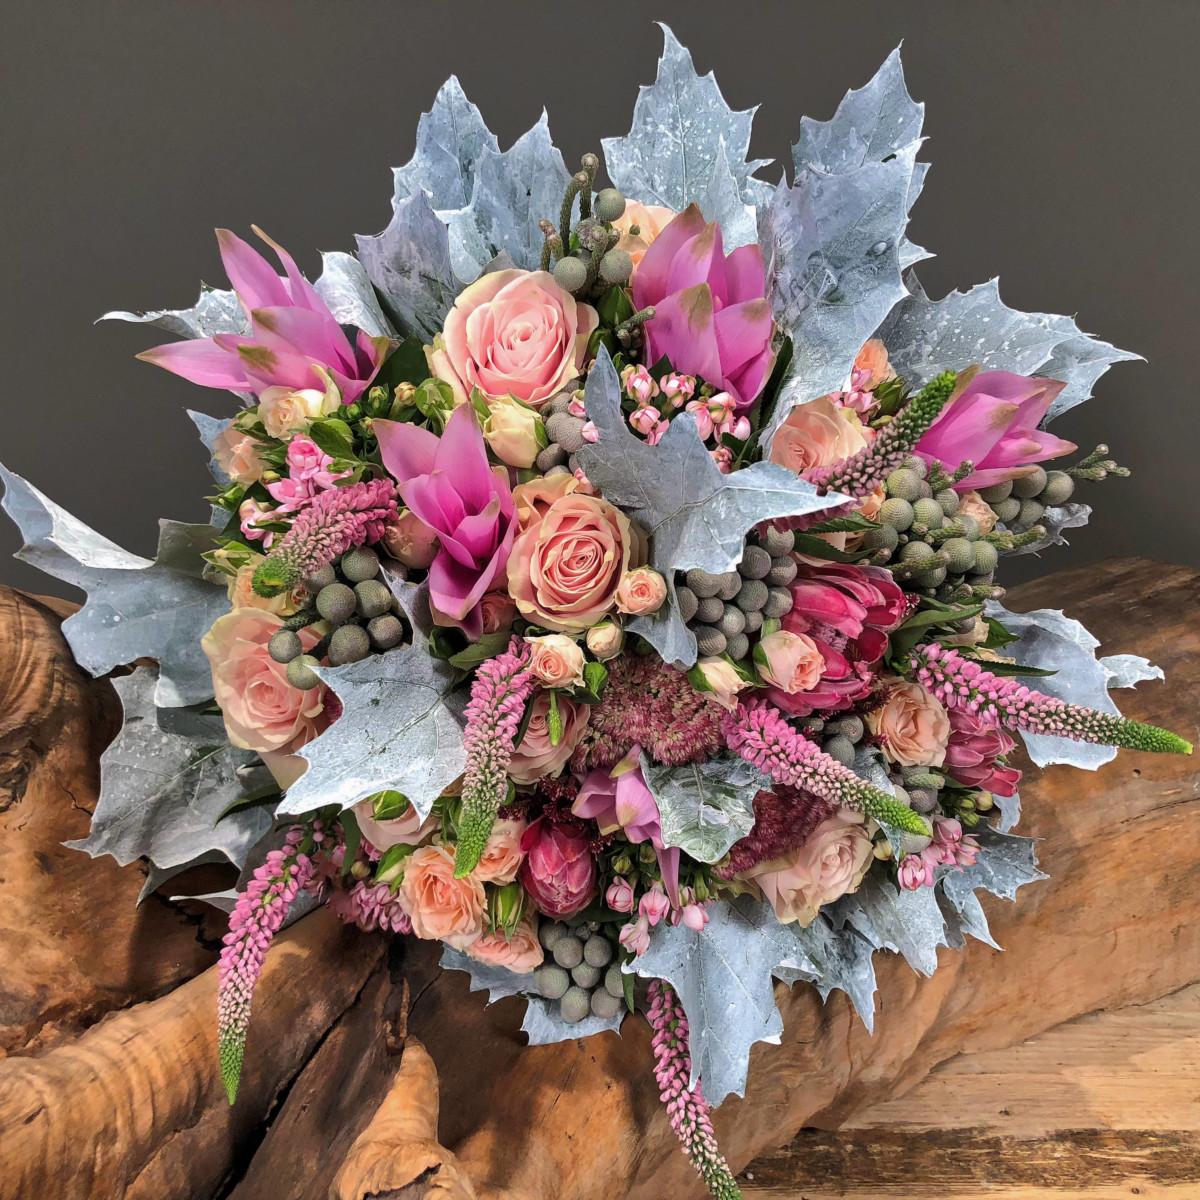 Bouquet Pink Roses Veronica Bouvardia